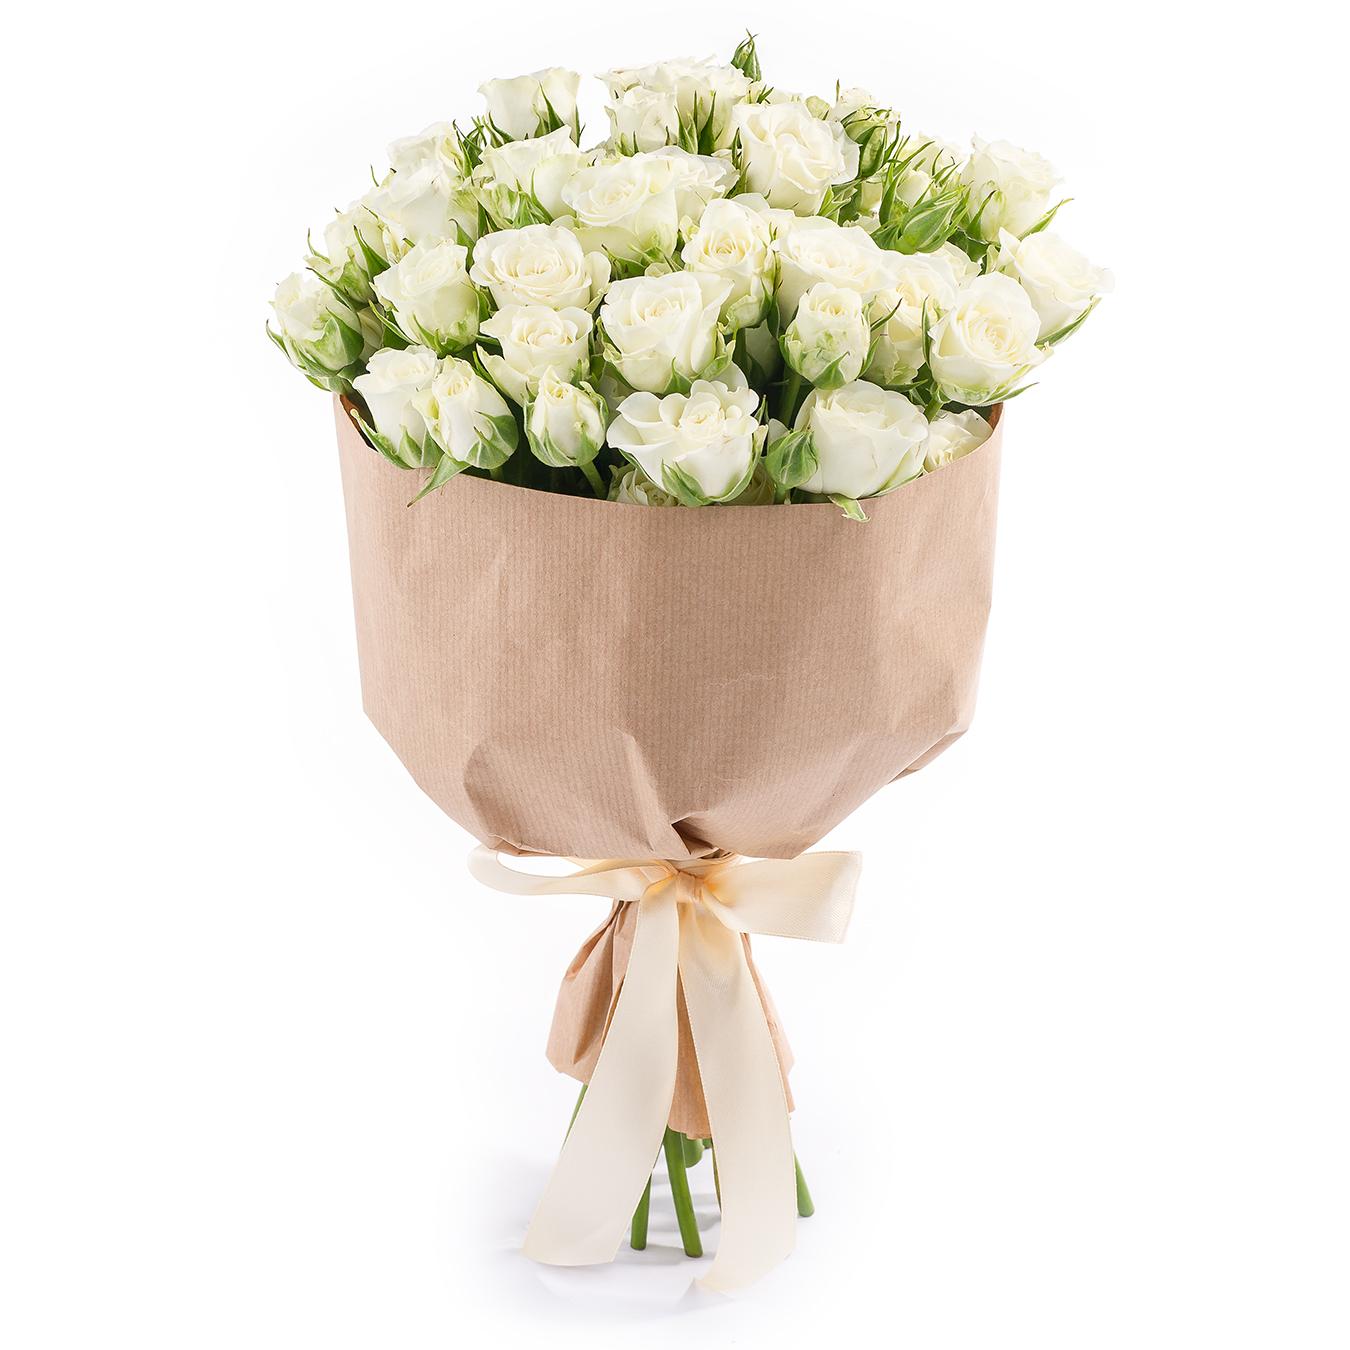 Букет из 11 кустовых роз<br>Ингредиенты: Роза кустовая 11 шт, Салал, Крафт 1 шт;